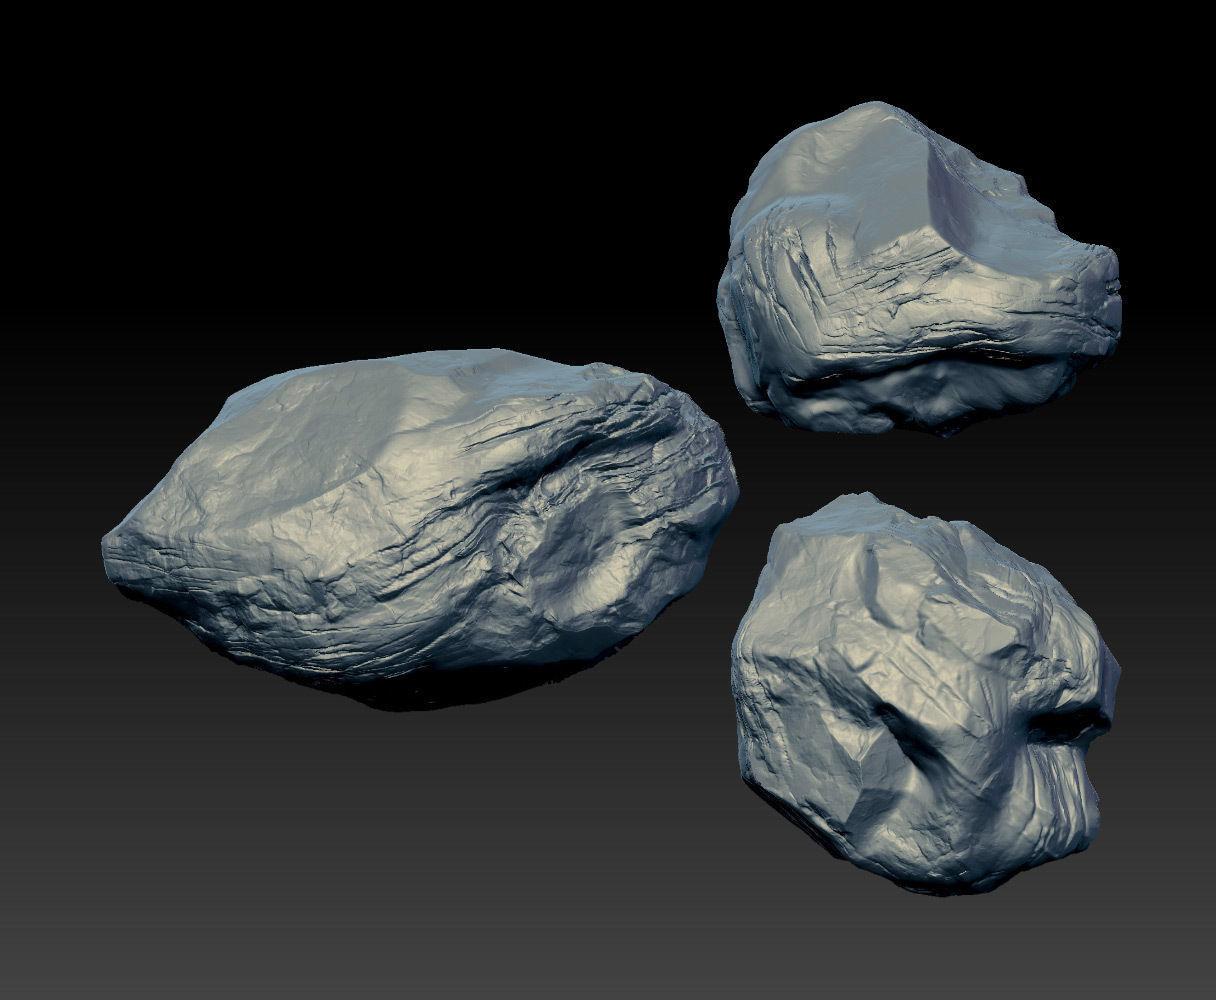 3 big rocks